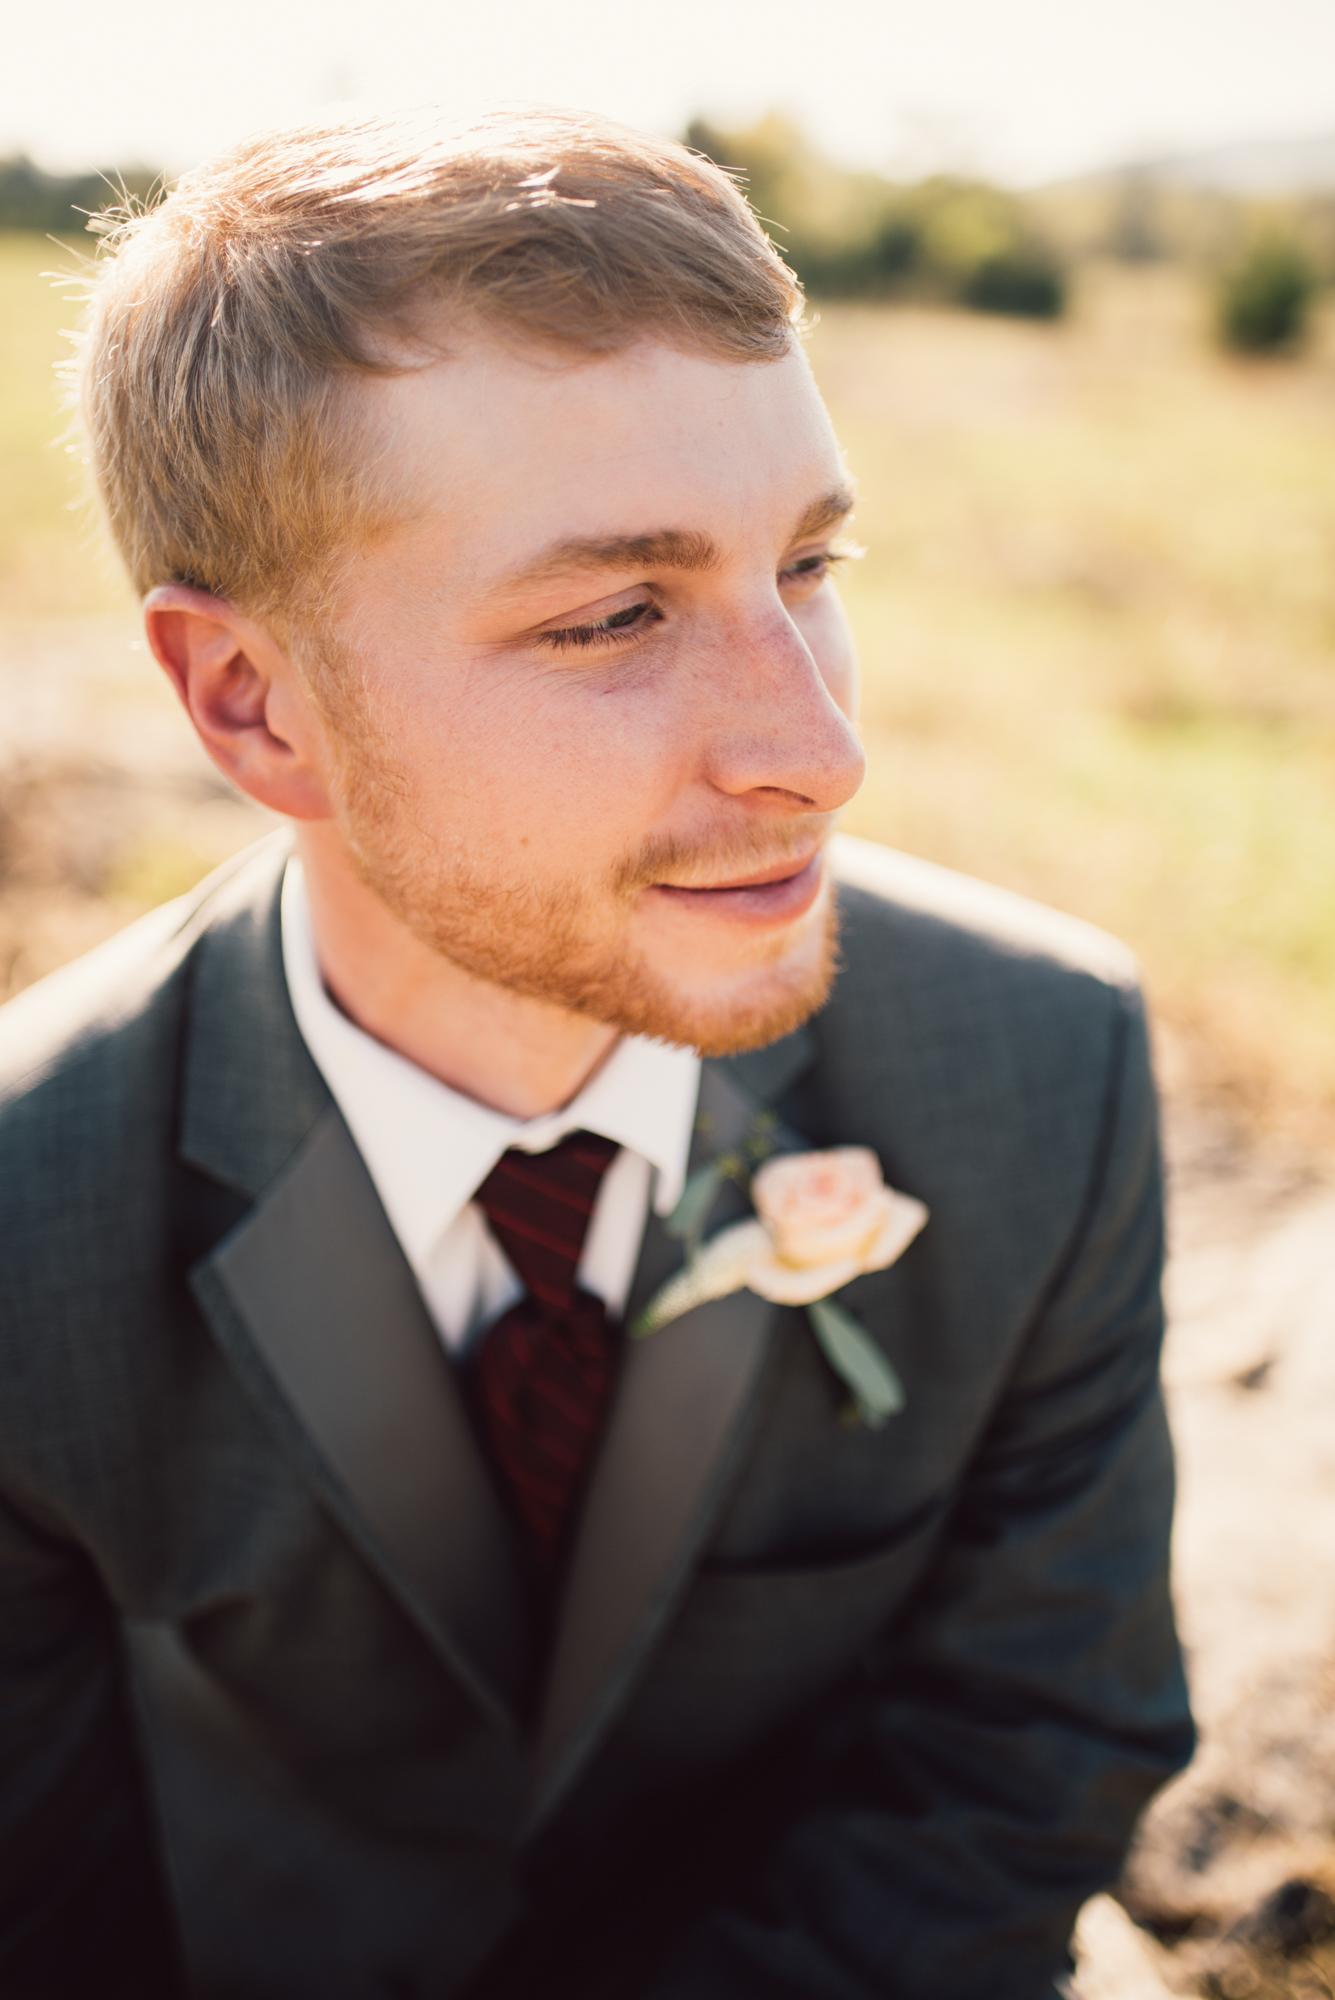 Ashley-and-Michael-Beaune-Woodstock-Virginia-Wedding-Shenandoah-Valley_27.JPG